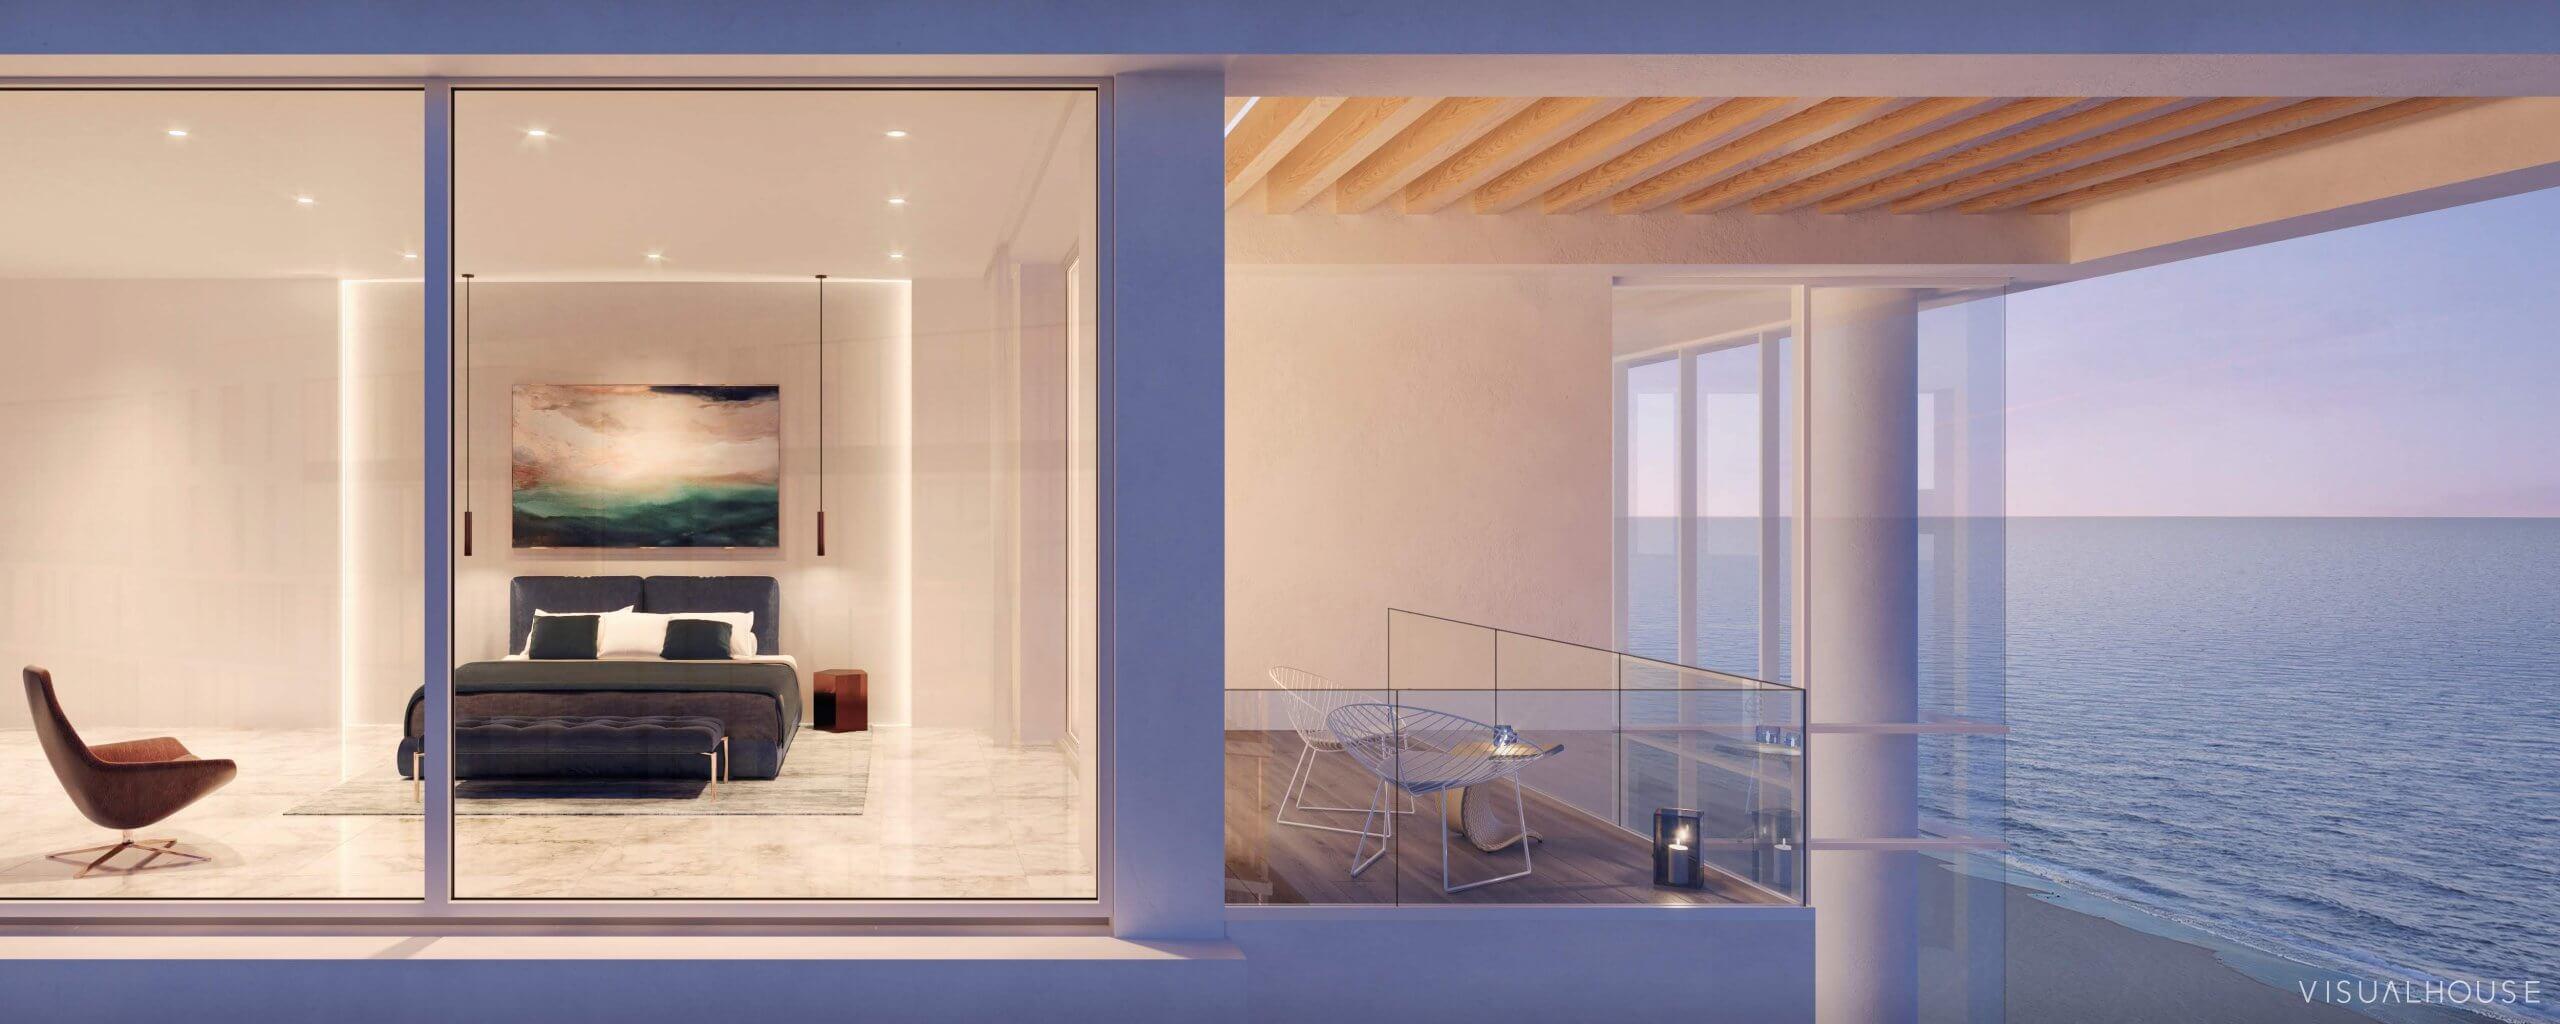 visualhouse_PH_Bedroom_Exterior-8.0